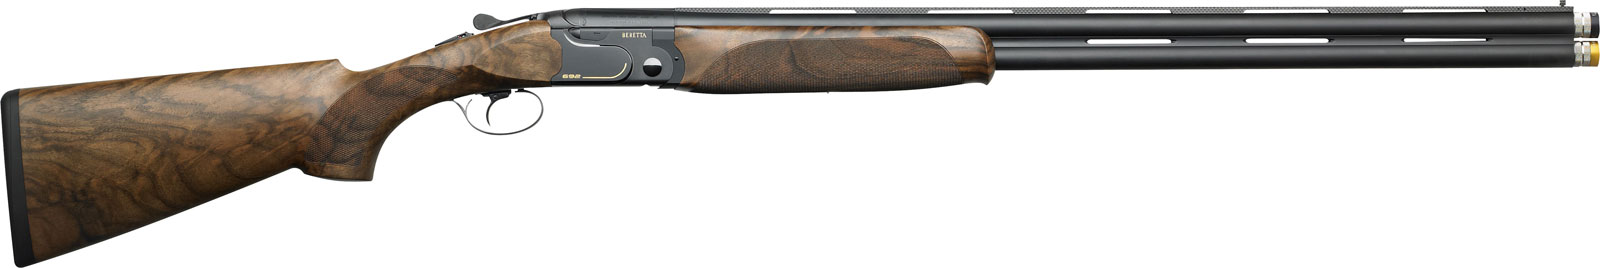 Beretta 692 Black Edition Sporting